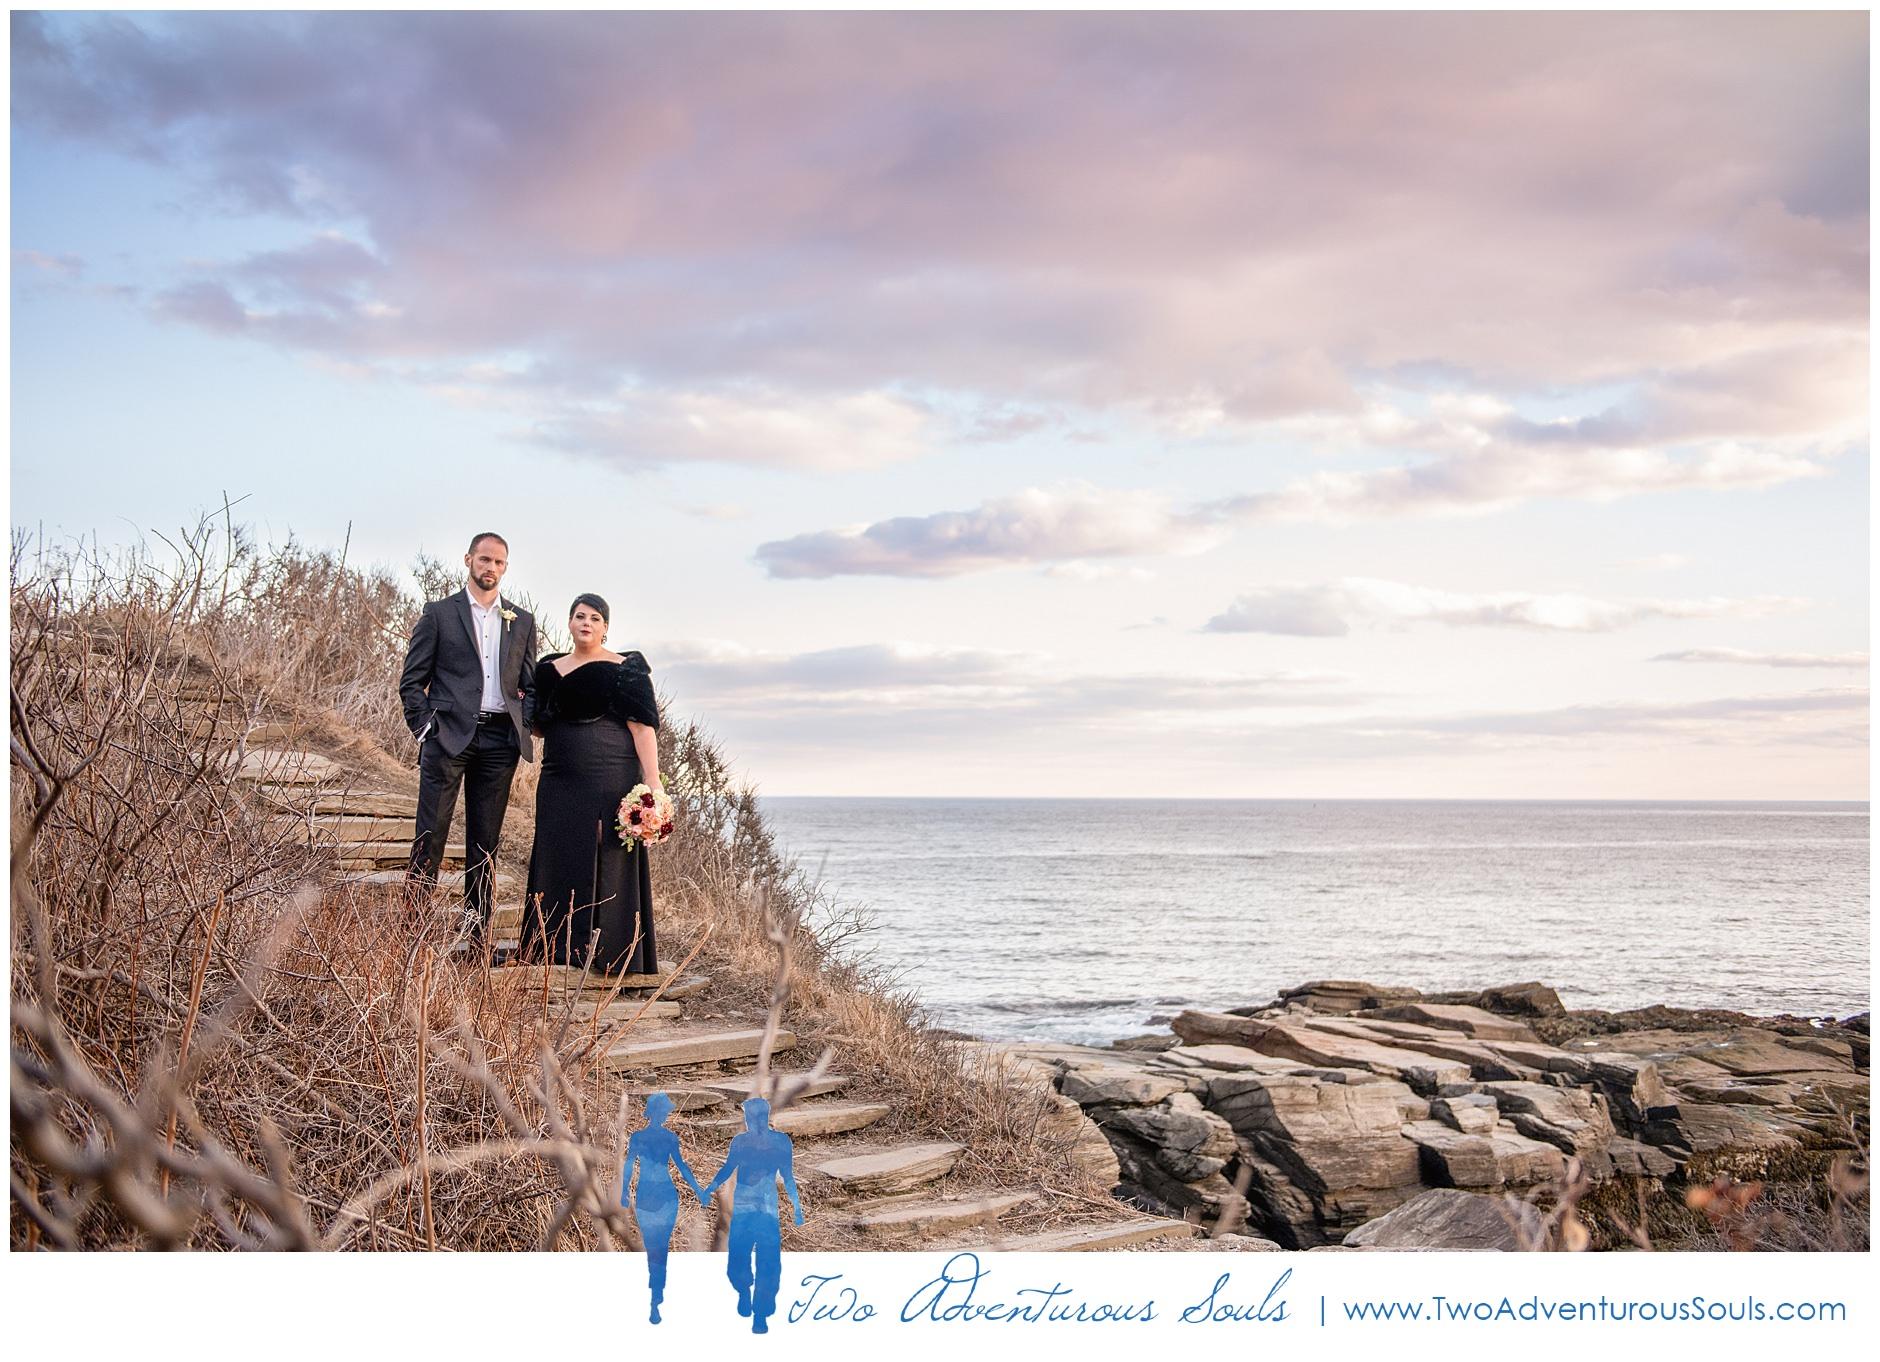 Inn by The Sea Elopement, Maine Elopement Photographer, Maine Wedding Photographers, Two Adventurous Souls_040619_0023.jpg